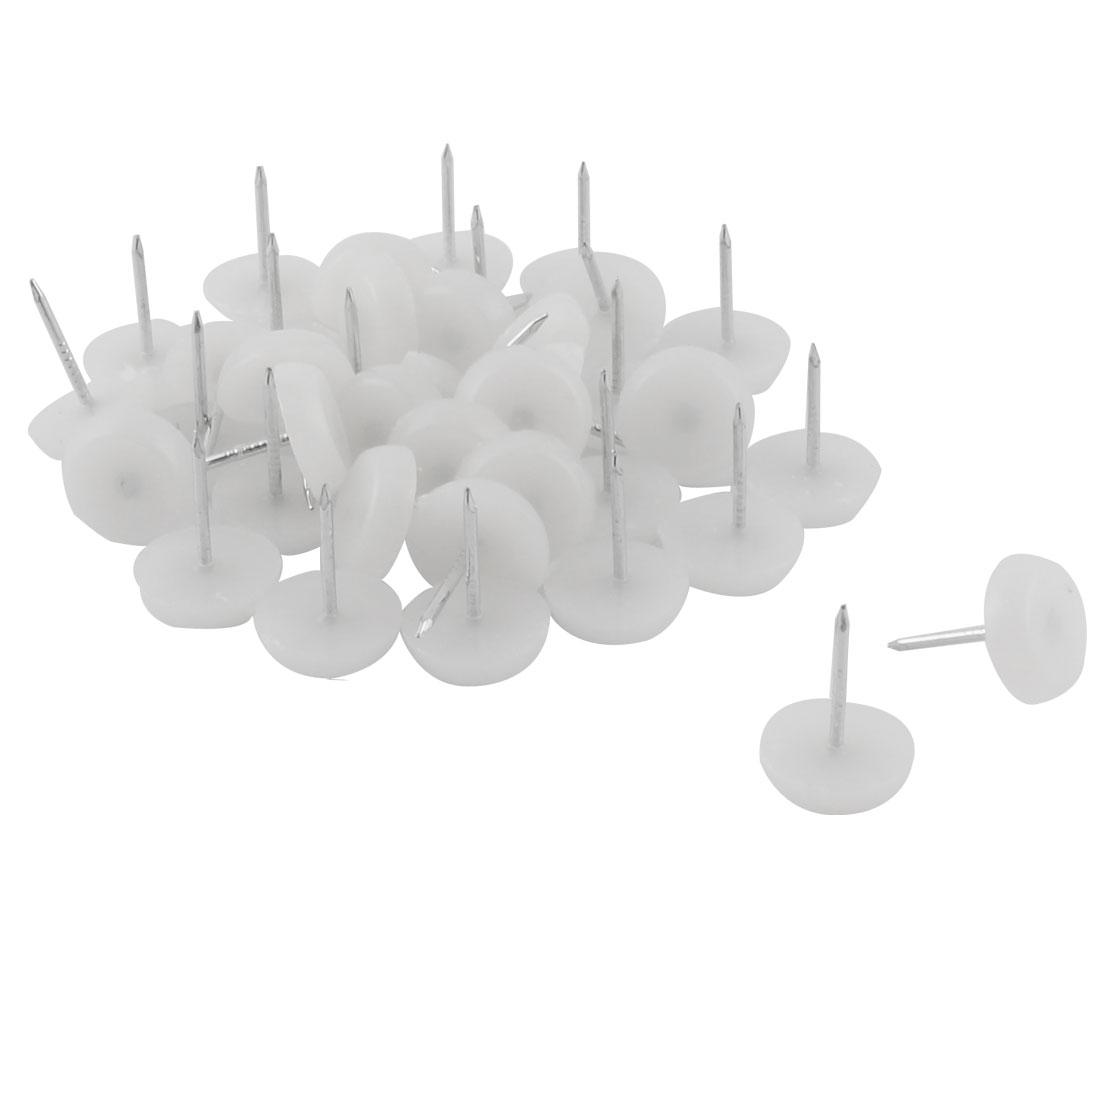 Furniture Chair Plastic Leg Feet Protector Non-slip Nails White 1.3cm Dia 30pcs